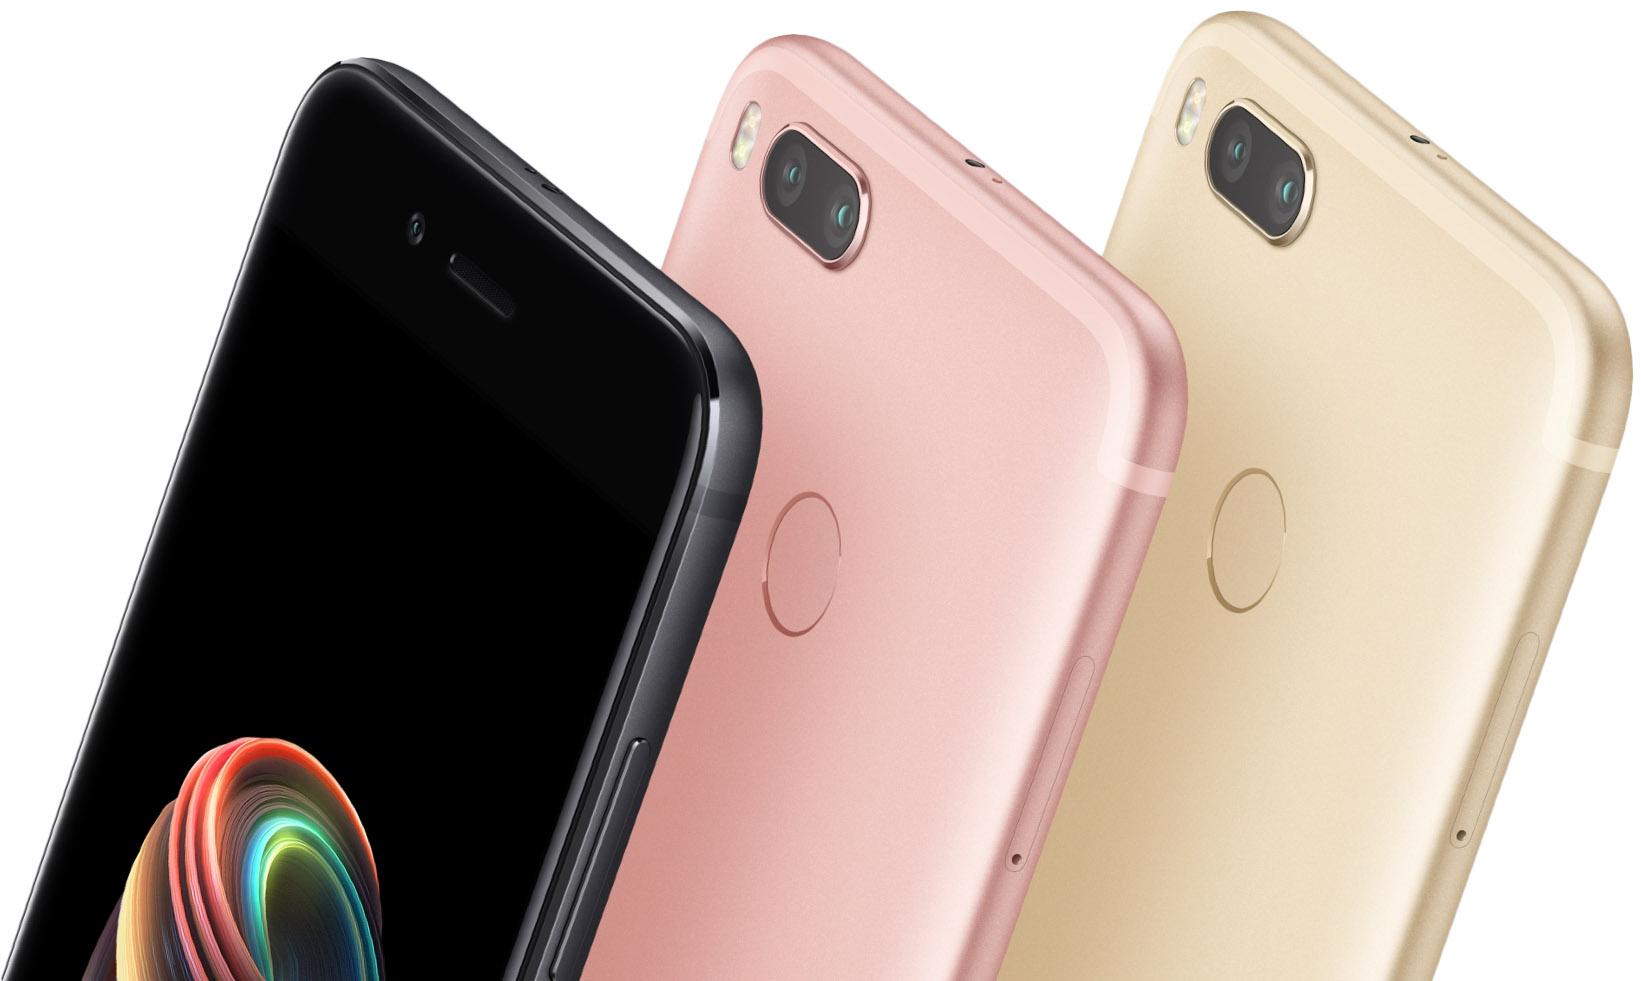 Získejte Xiaomi Mi A1 s plnou LTE podporou a dalšími vychytávkami [sponzorovaný článek]